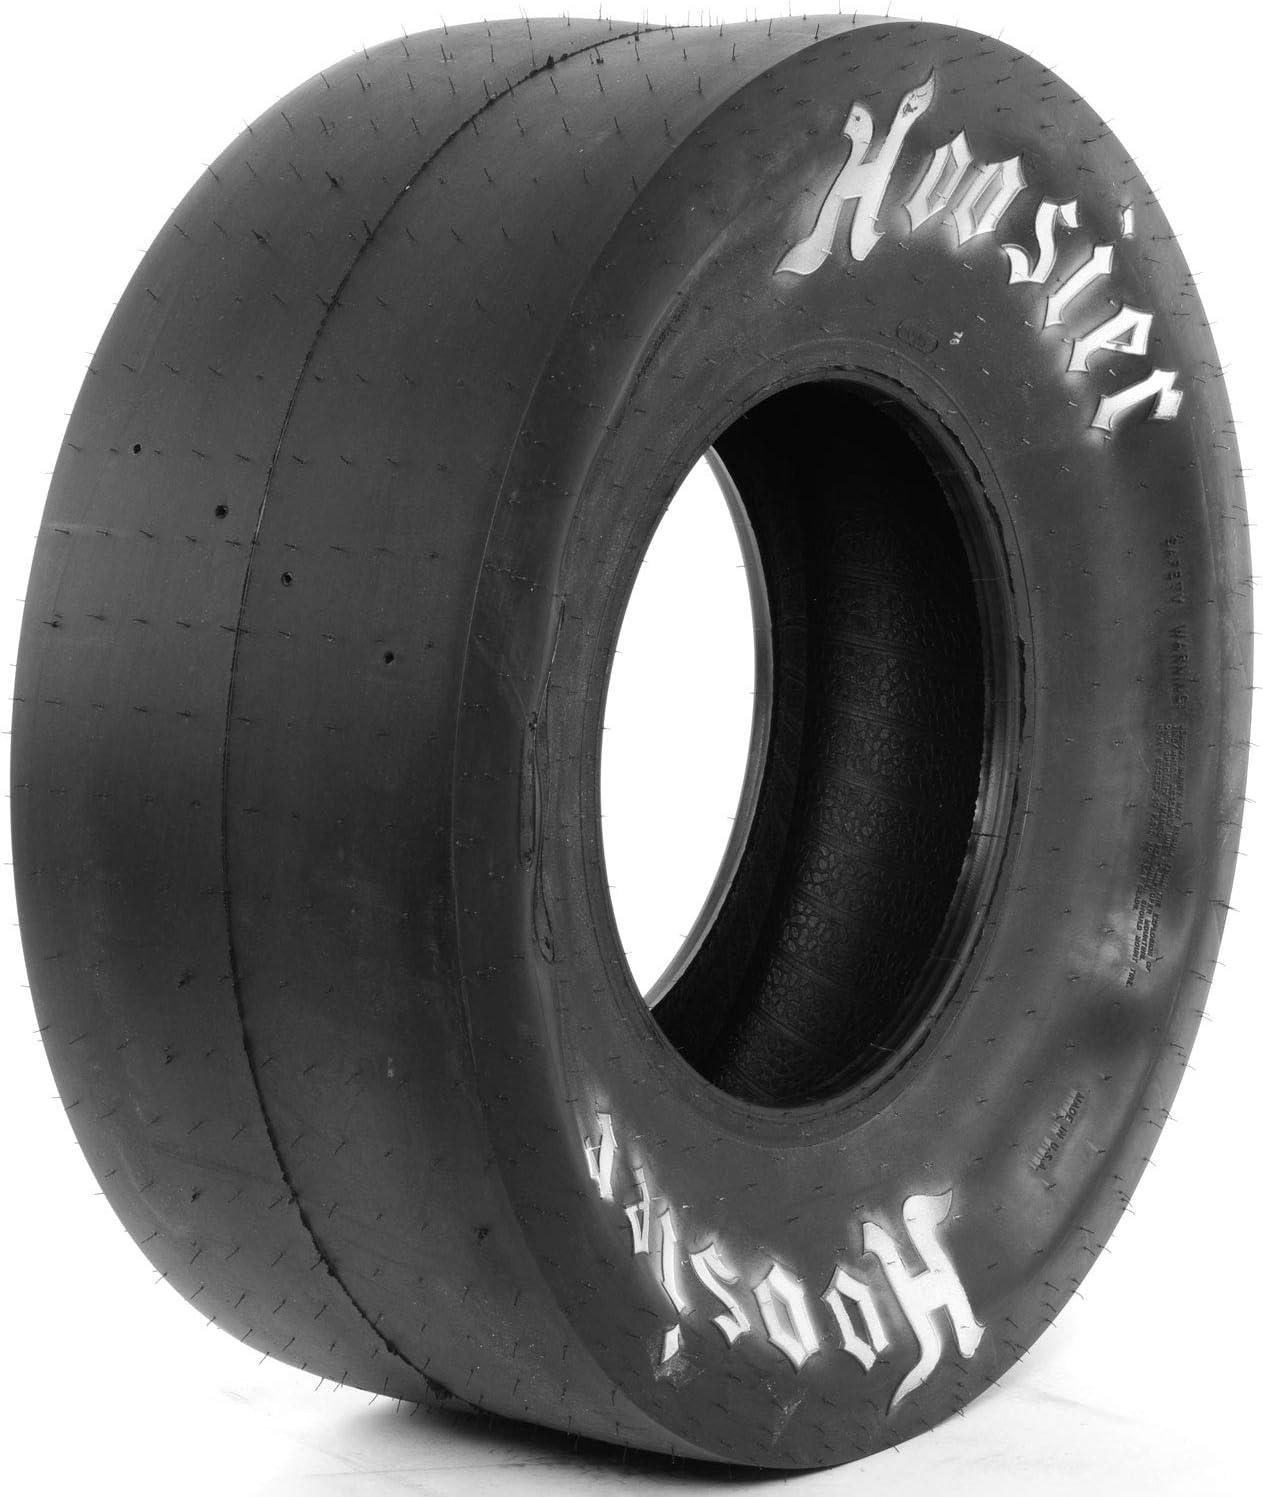 Hoosier Racing Tires Drag Tire 30.0 Ranking TOP14 10.5R15 Lowest price challenge